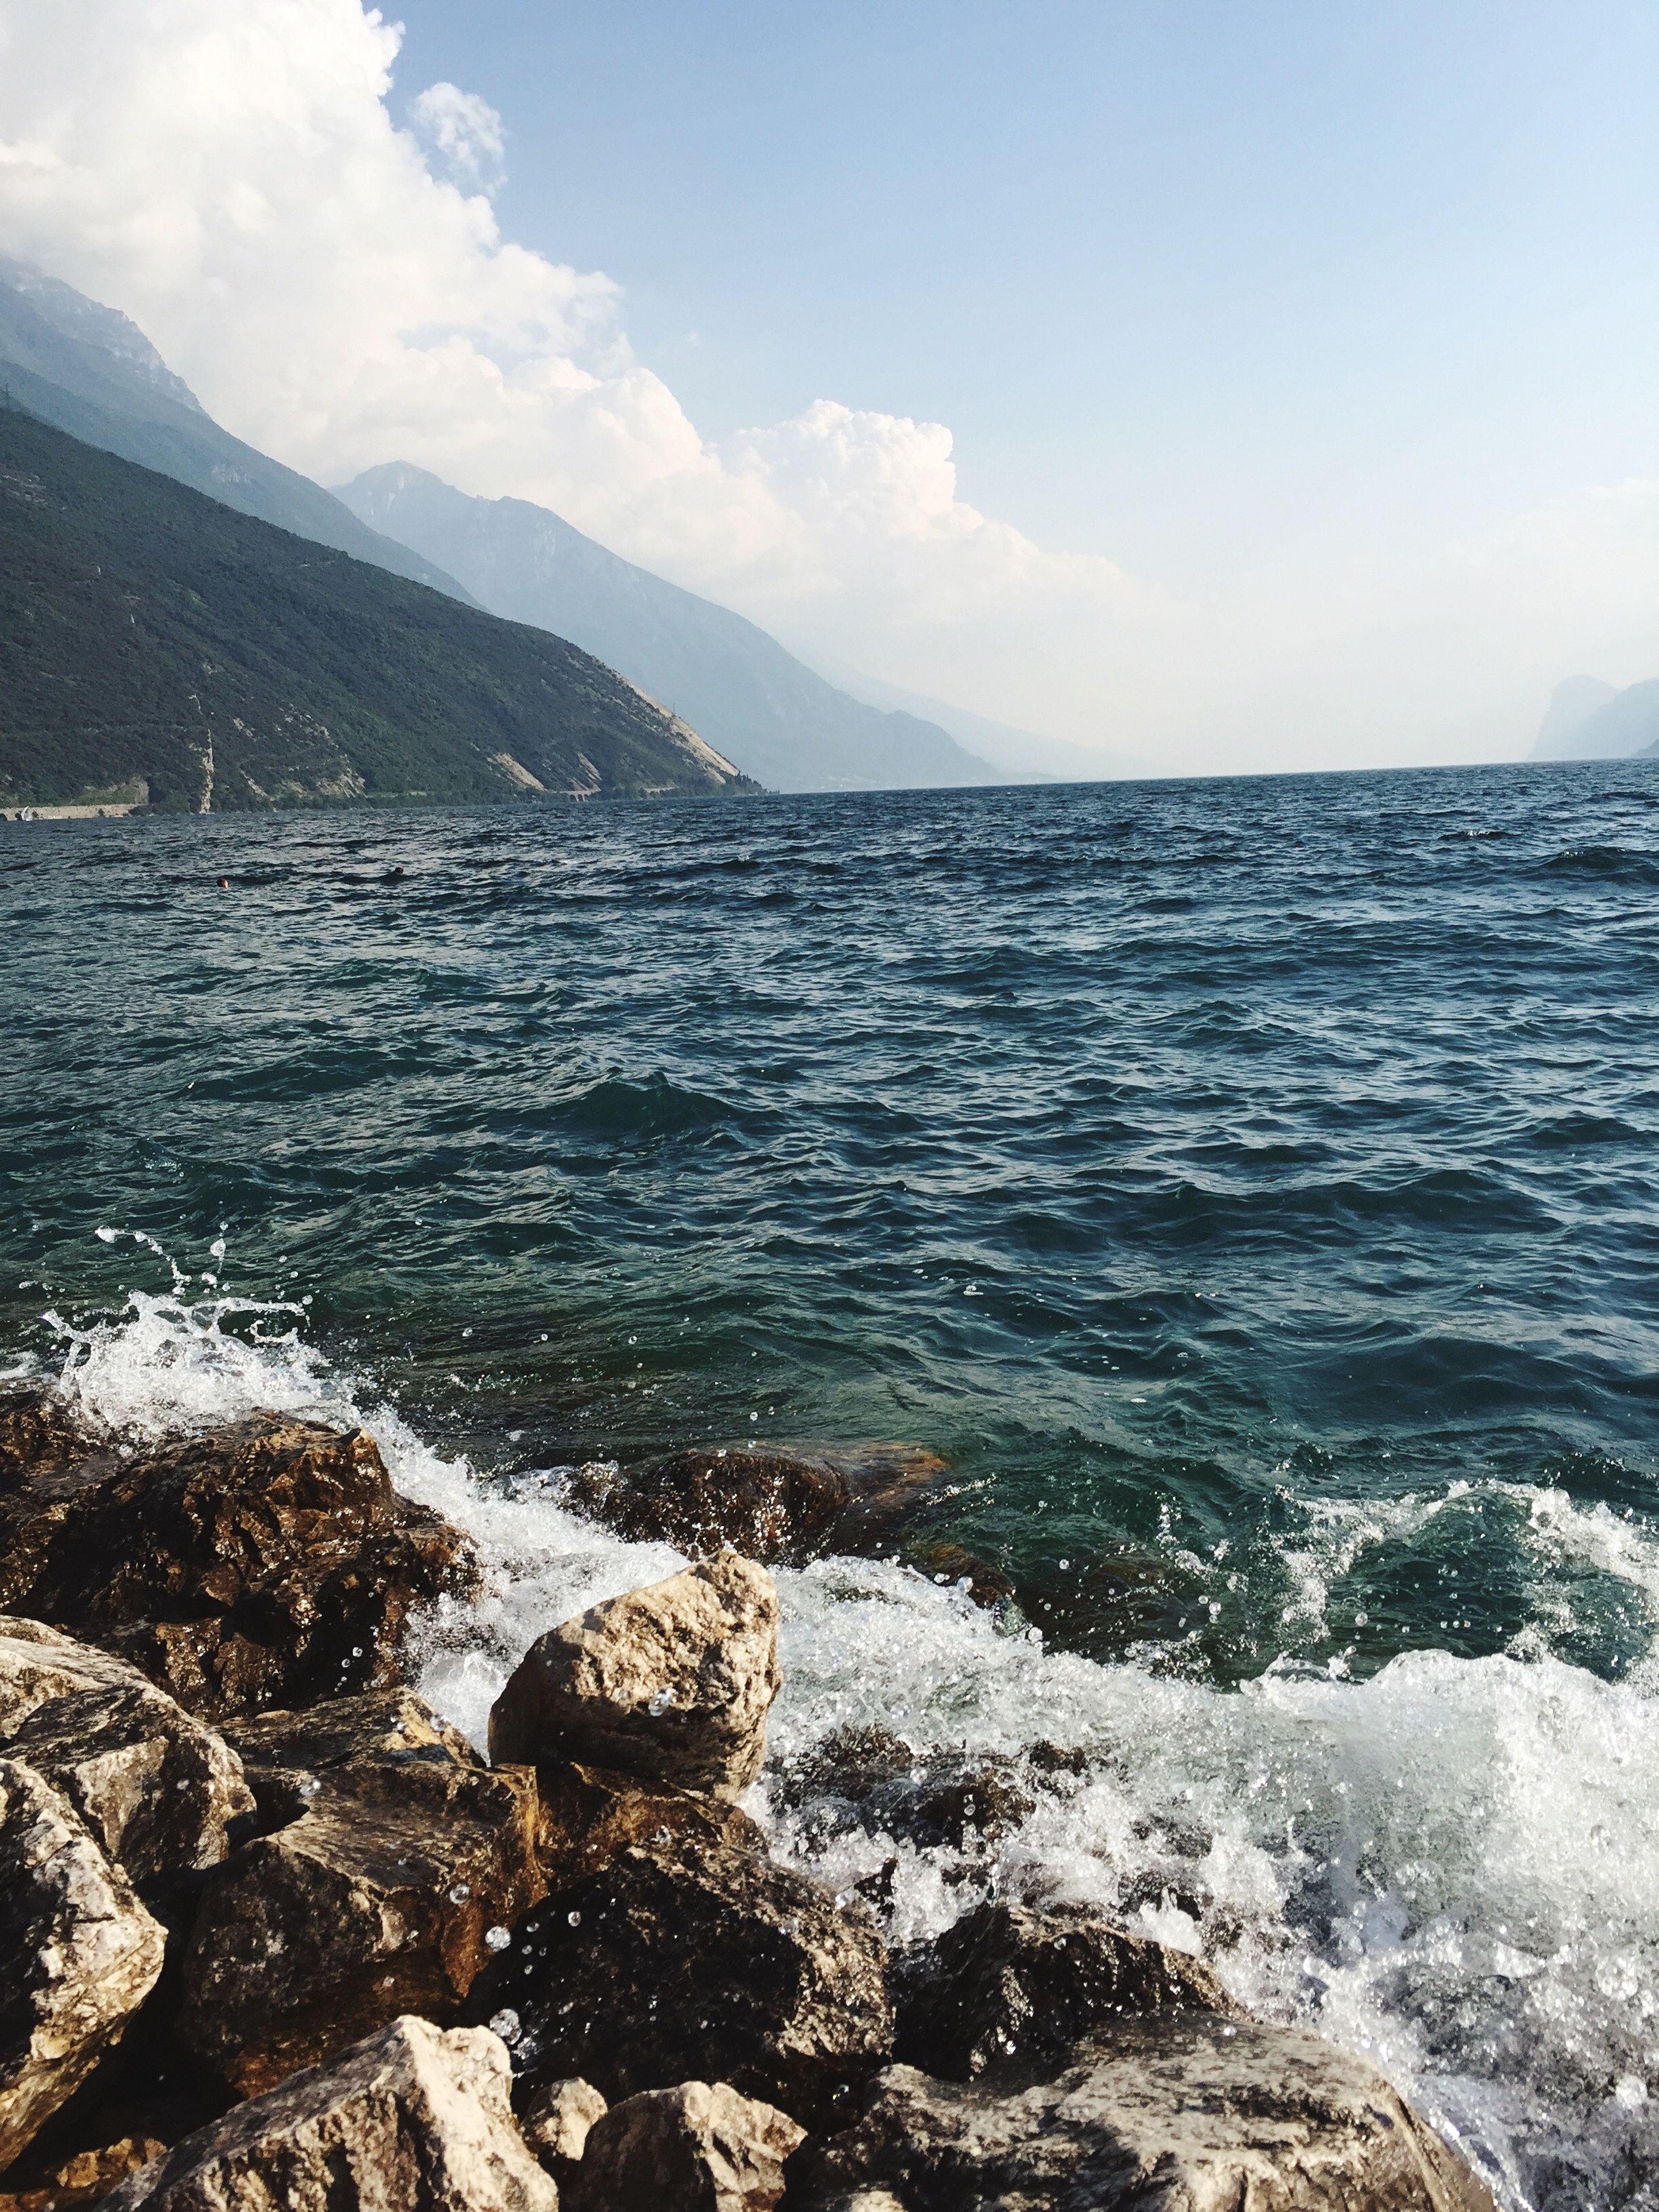 water, sea, scenics, tranquil scene, beauty in nature, tranquility, sky, nature, horizon over water, beach, shore, rock - object, idyllic, wave, mountain, coastline, remote, non-urban scene, surf, rippled